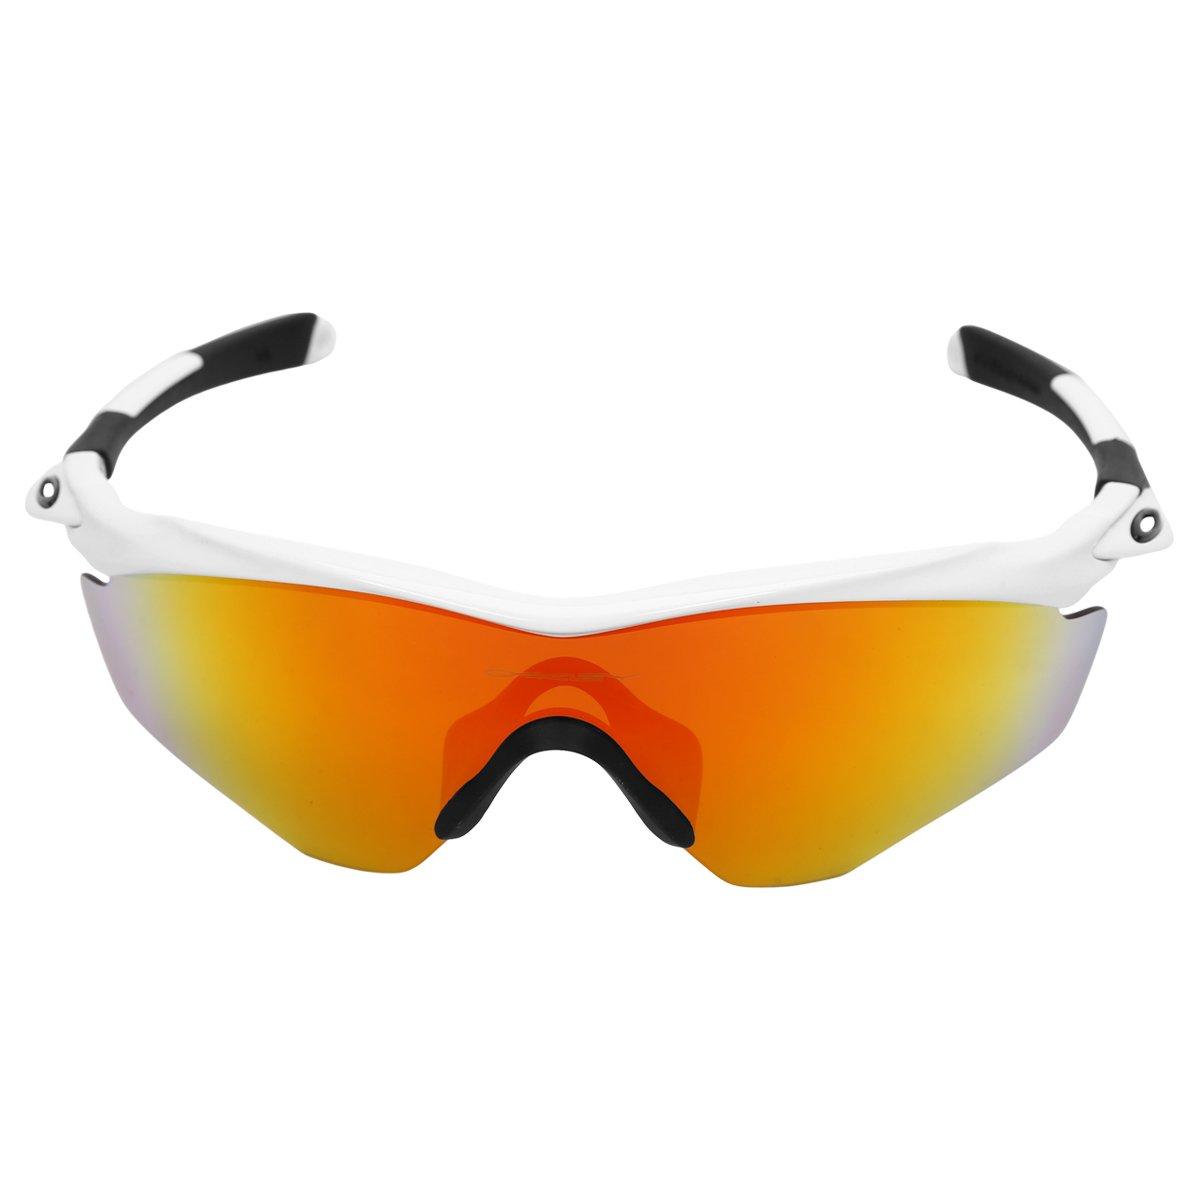 972b948ec5d9d Óculos Oakley M2 Frame XL - Compre Agora   Netshoes